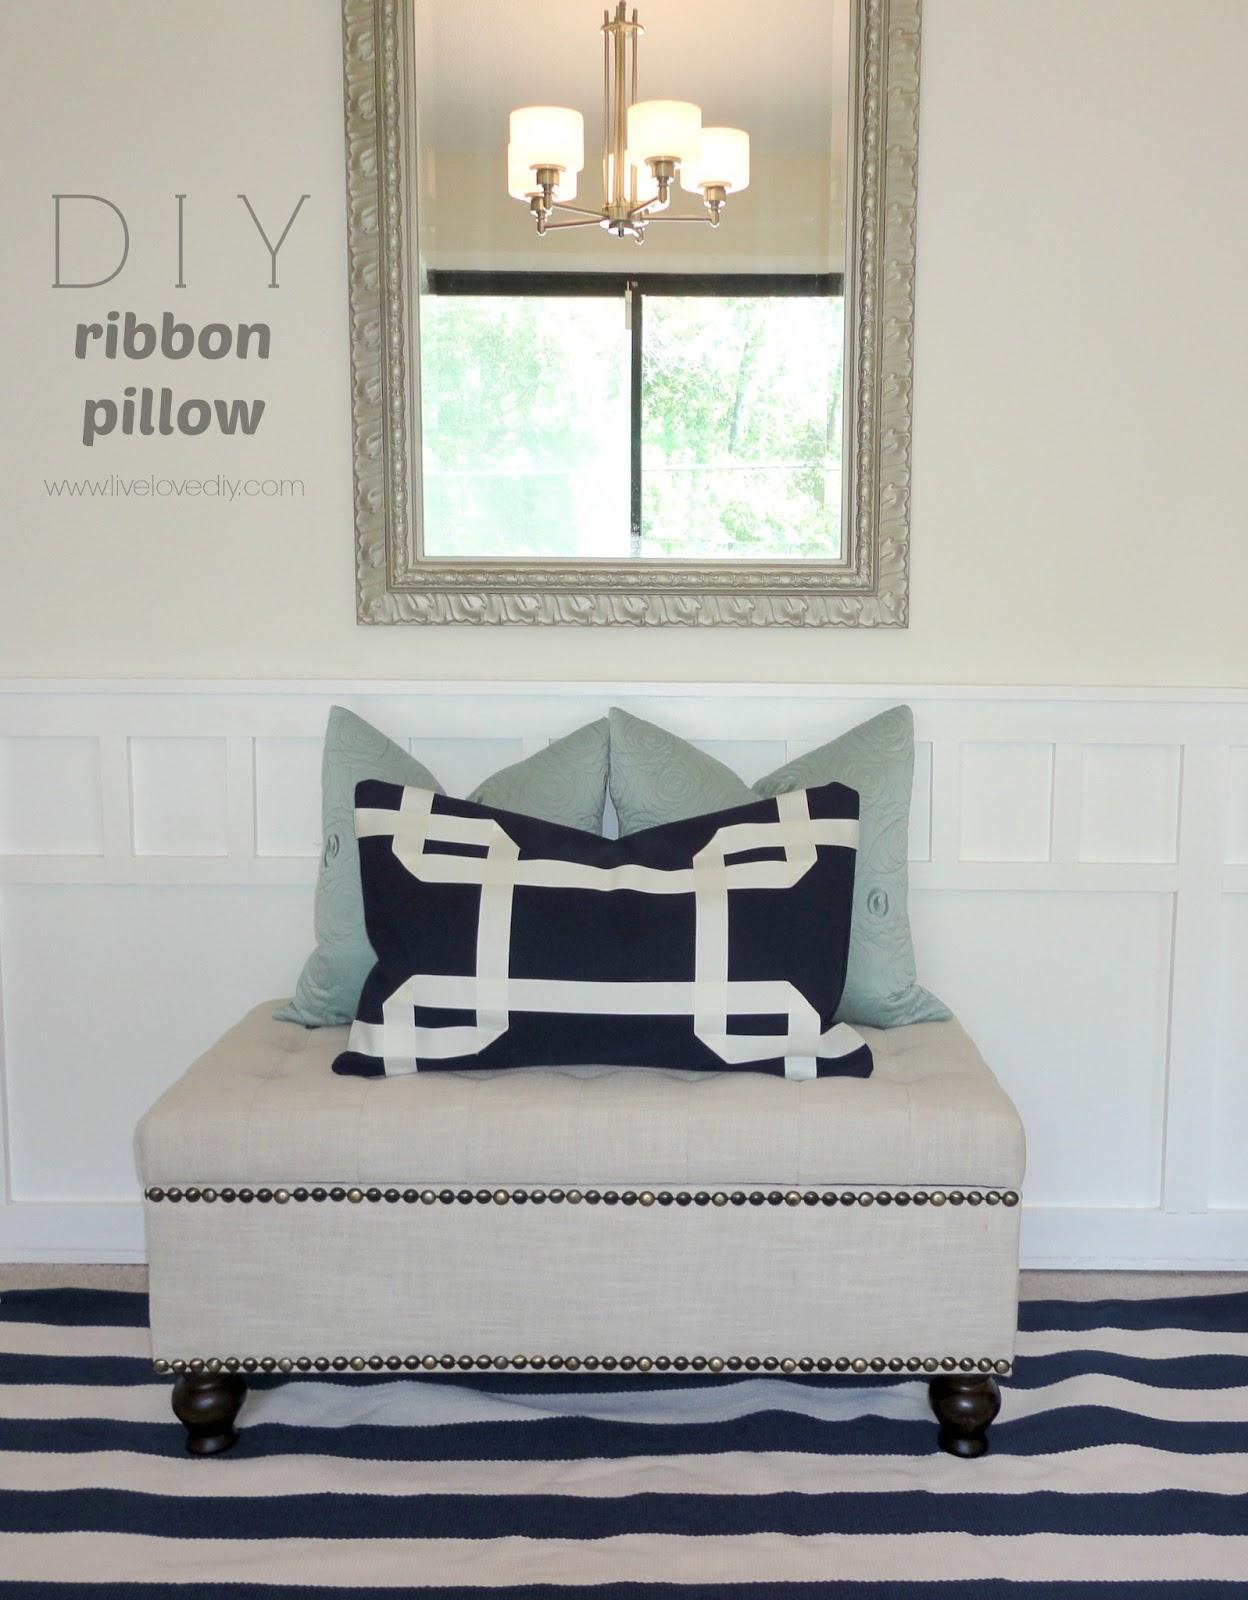 Live Love Diy No Sew Pillow: LiveLoveDIY  DIY No Sew Greek Key Ribbon Pillows,